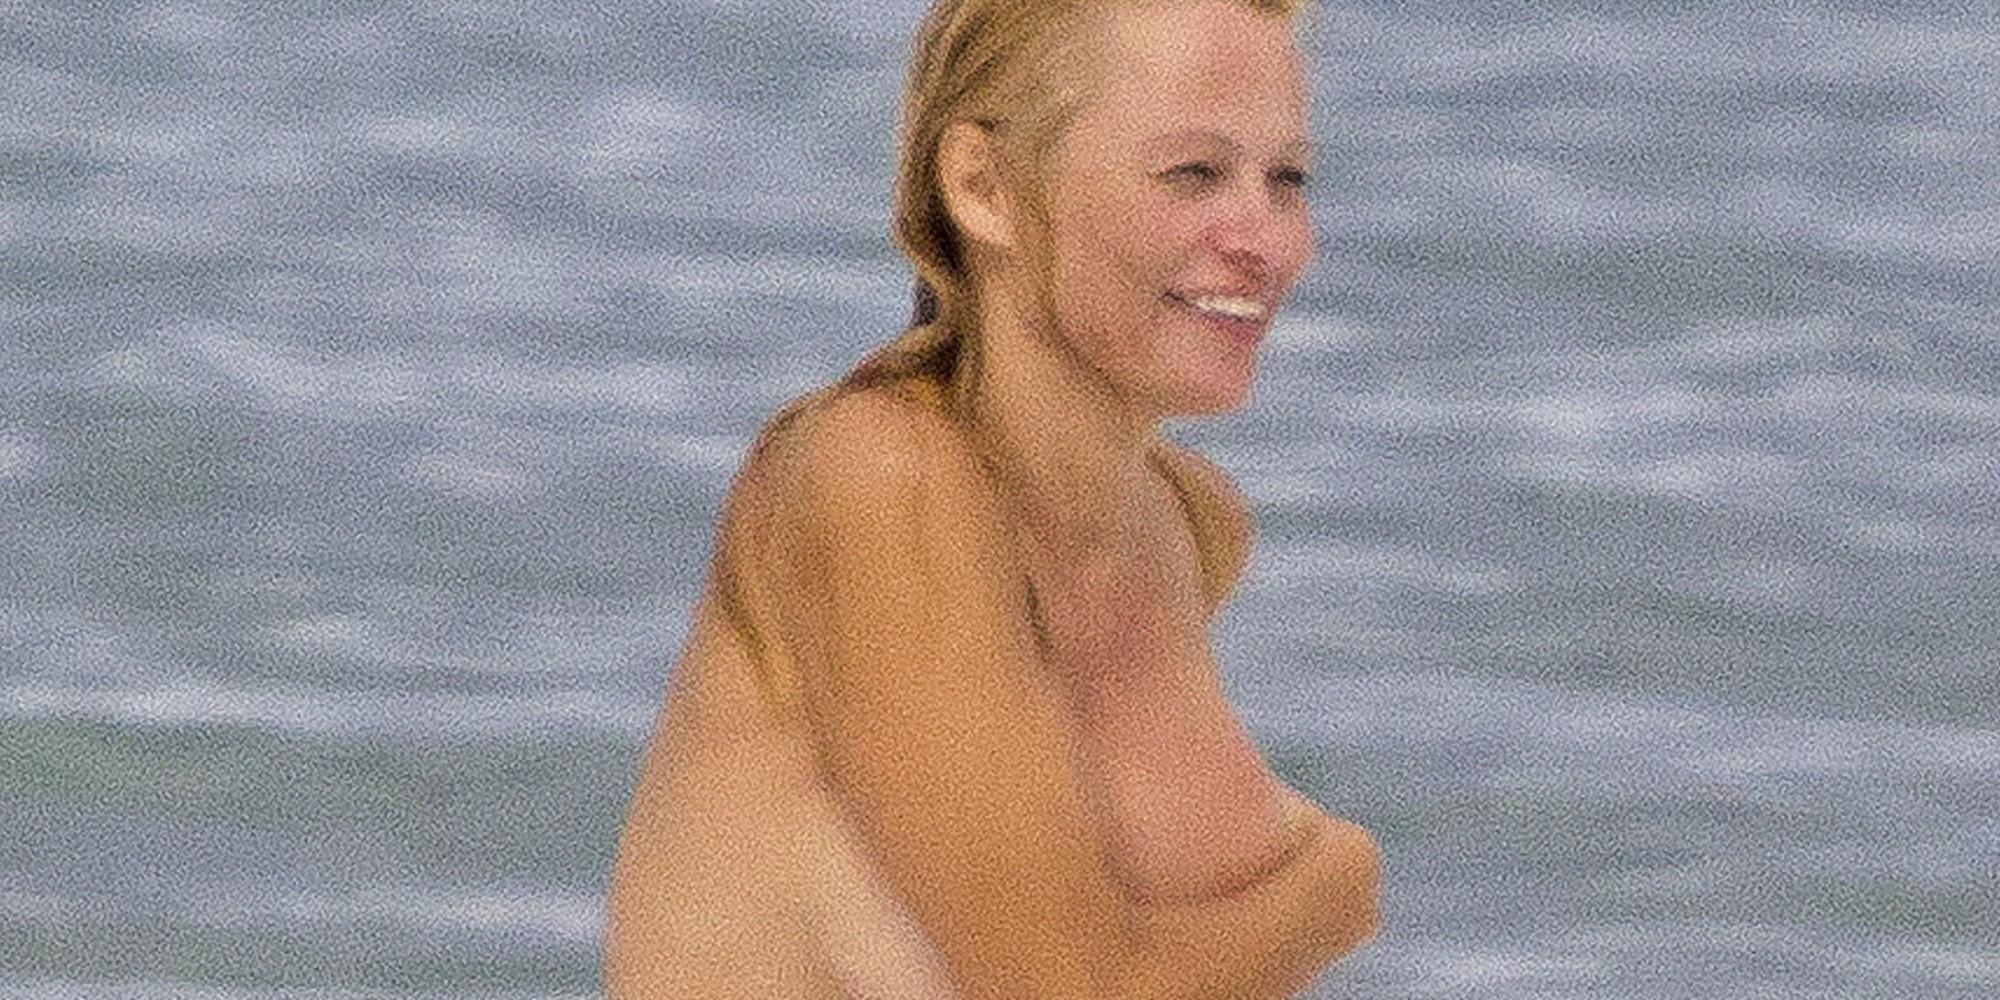 mom naked self shot pics